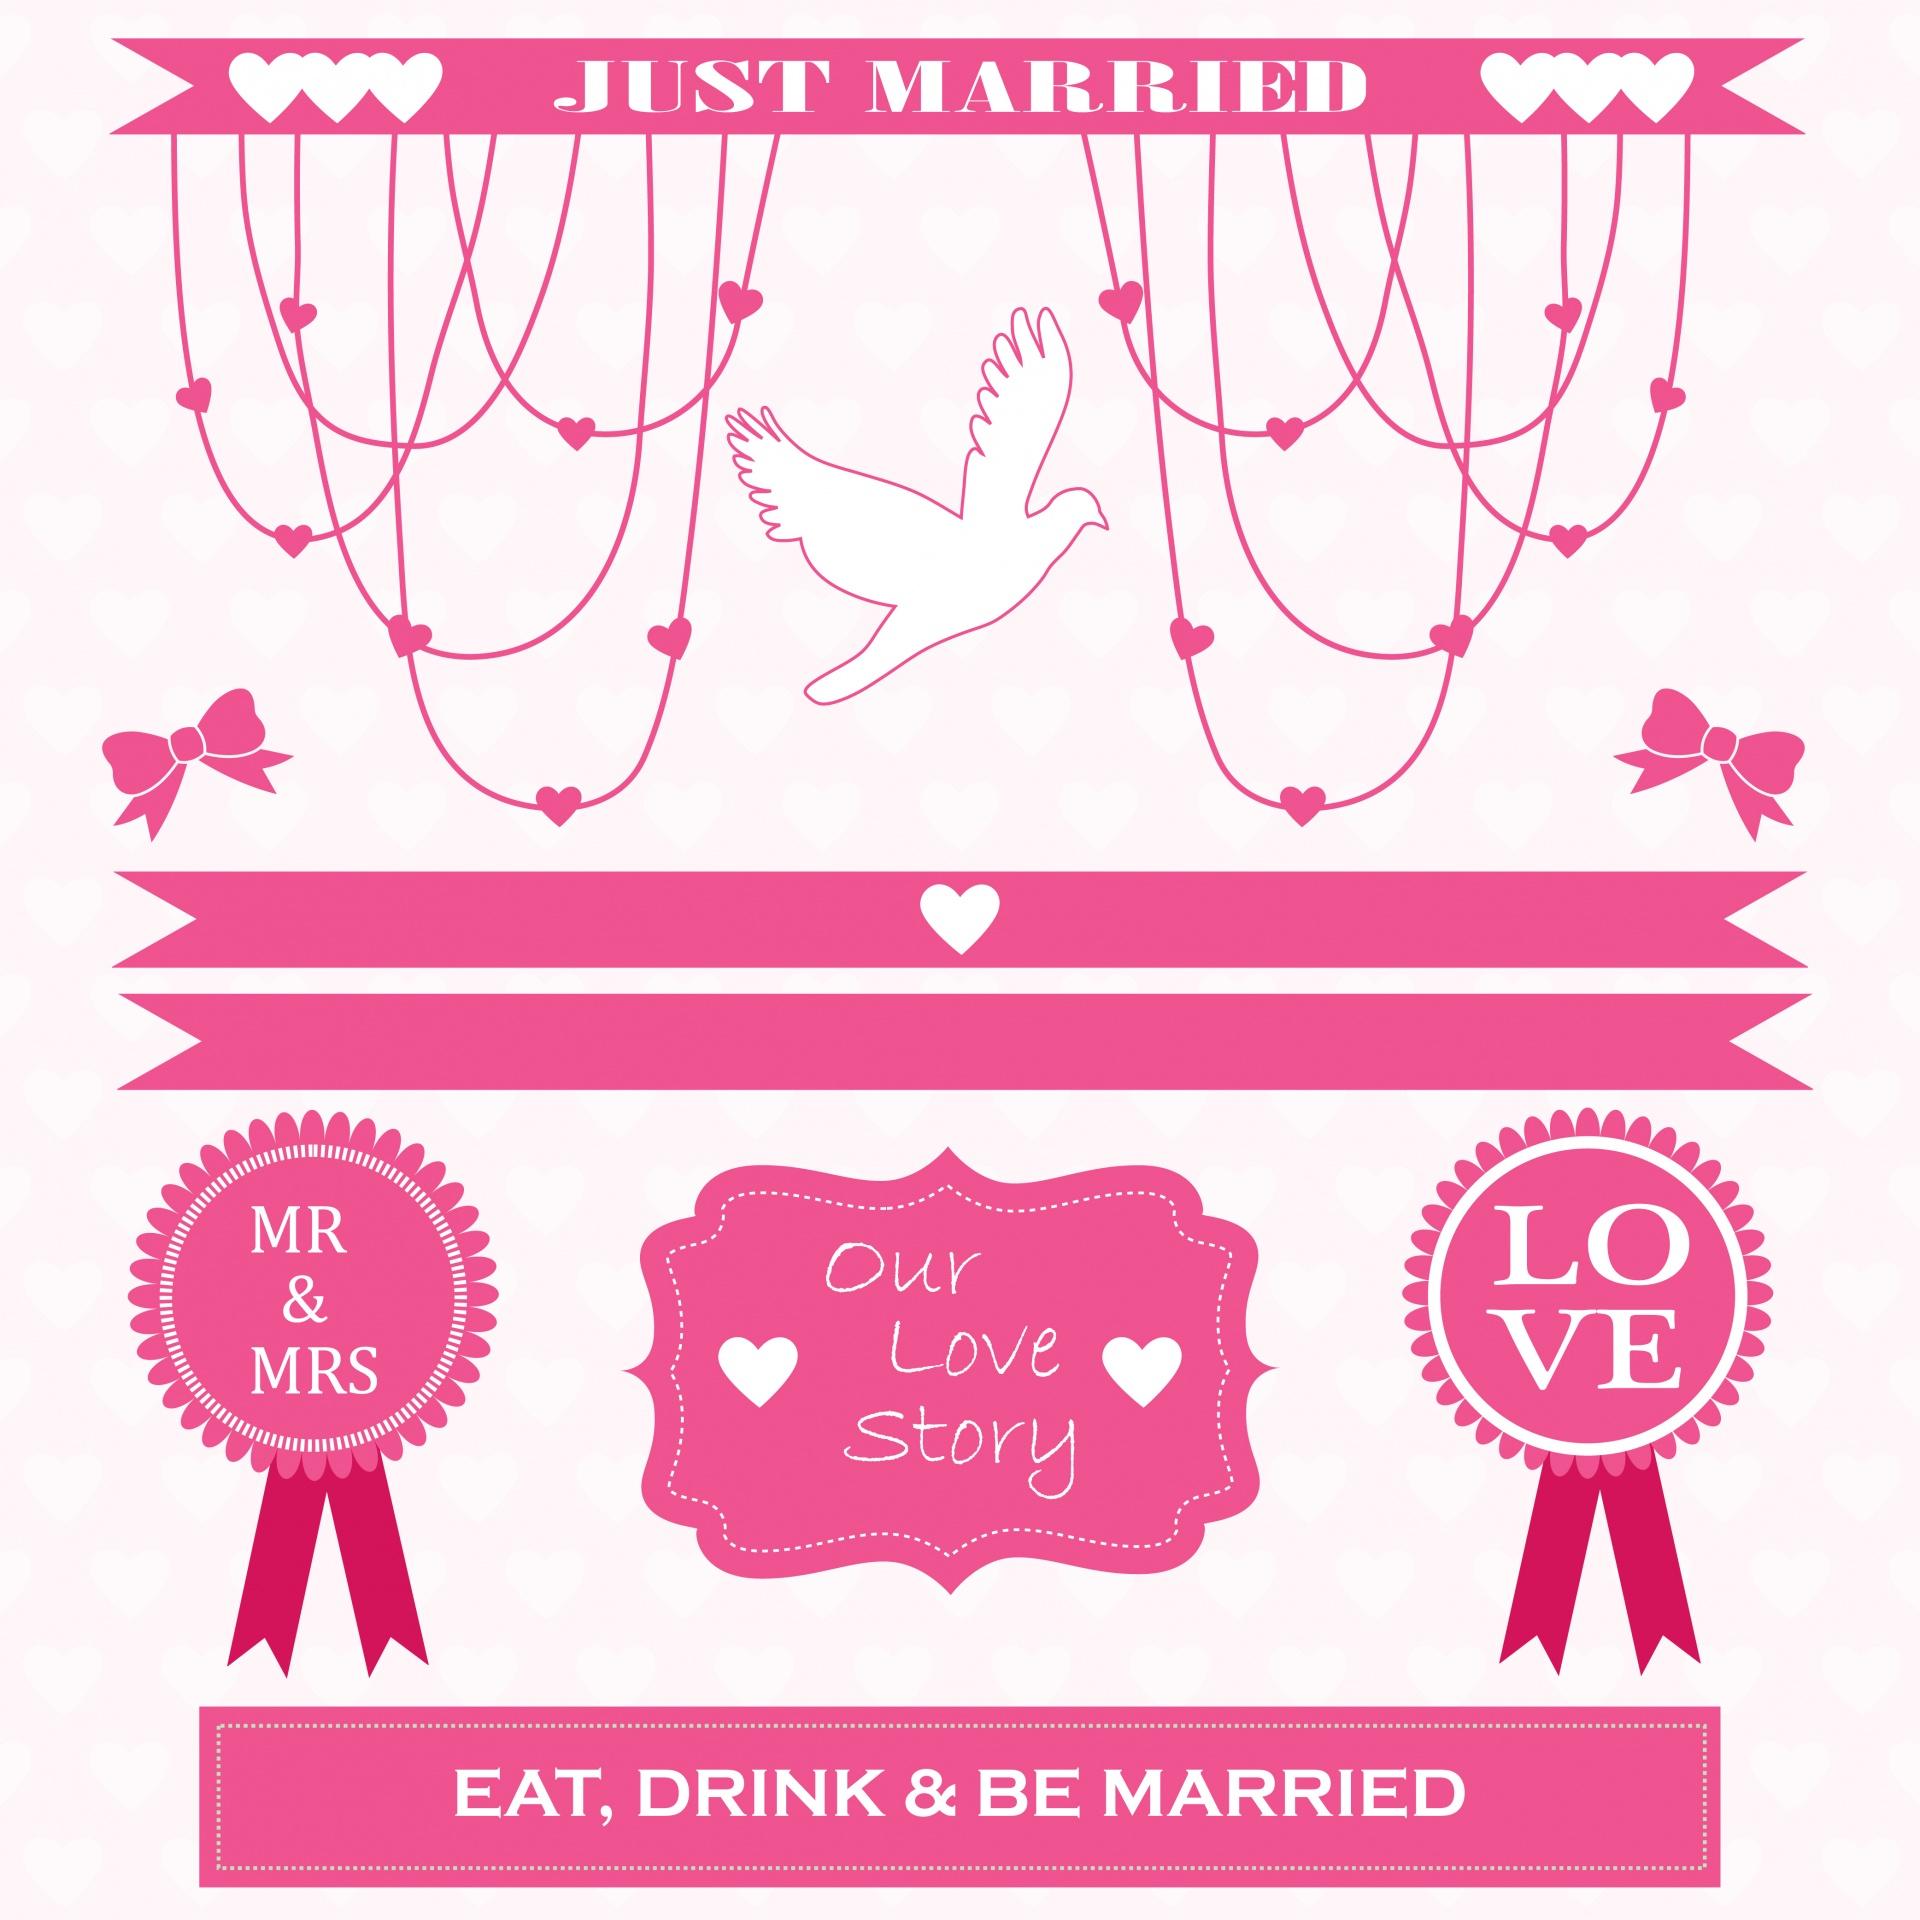 Wedding Card Free Stock Photo.